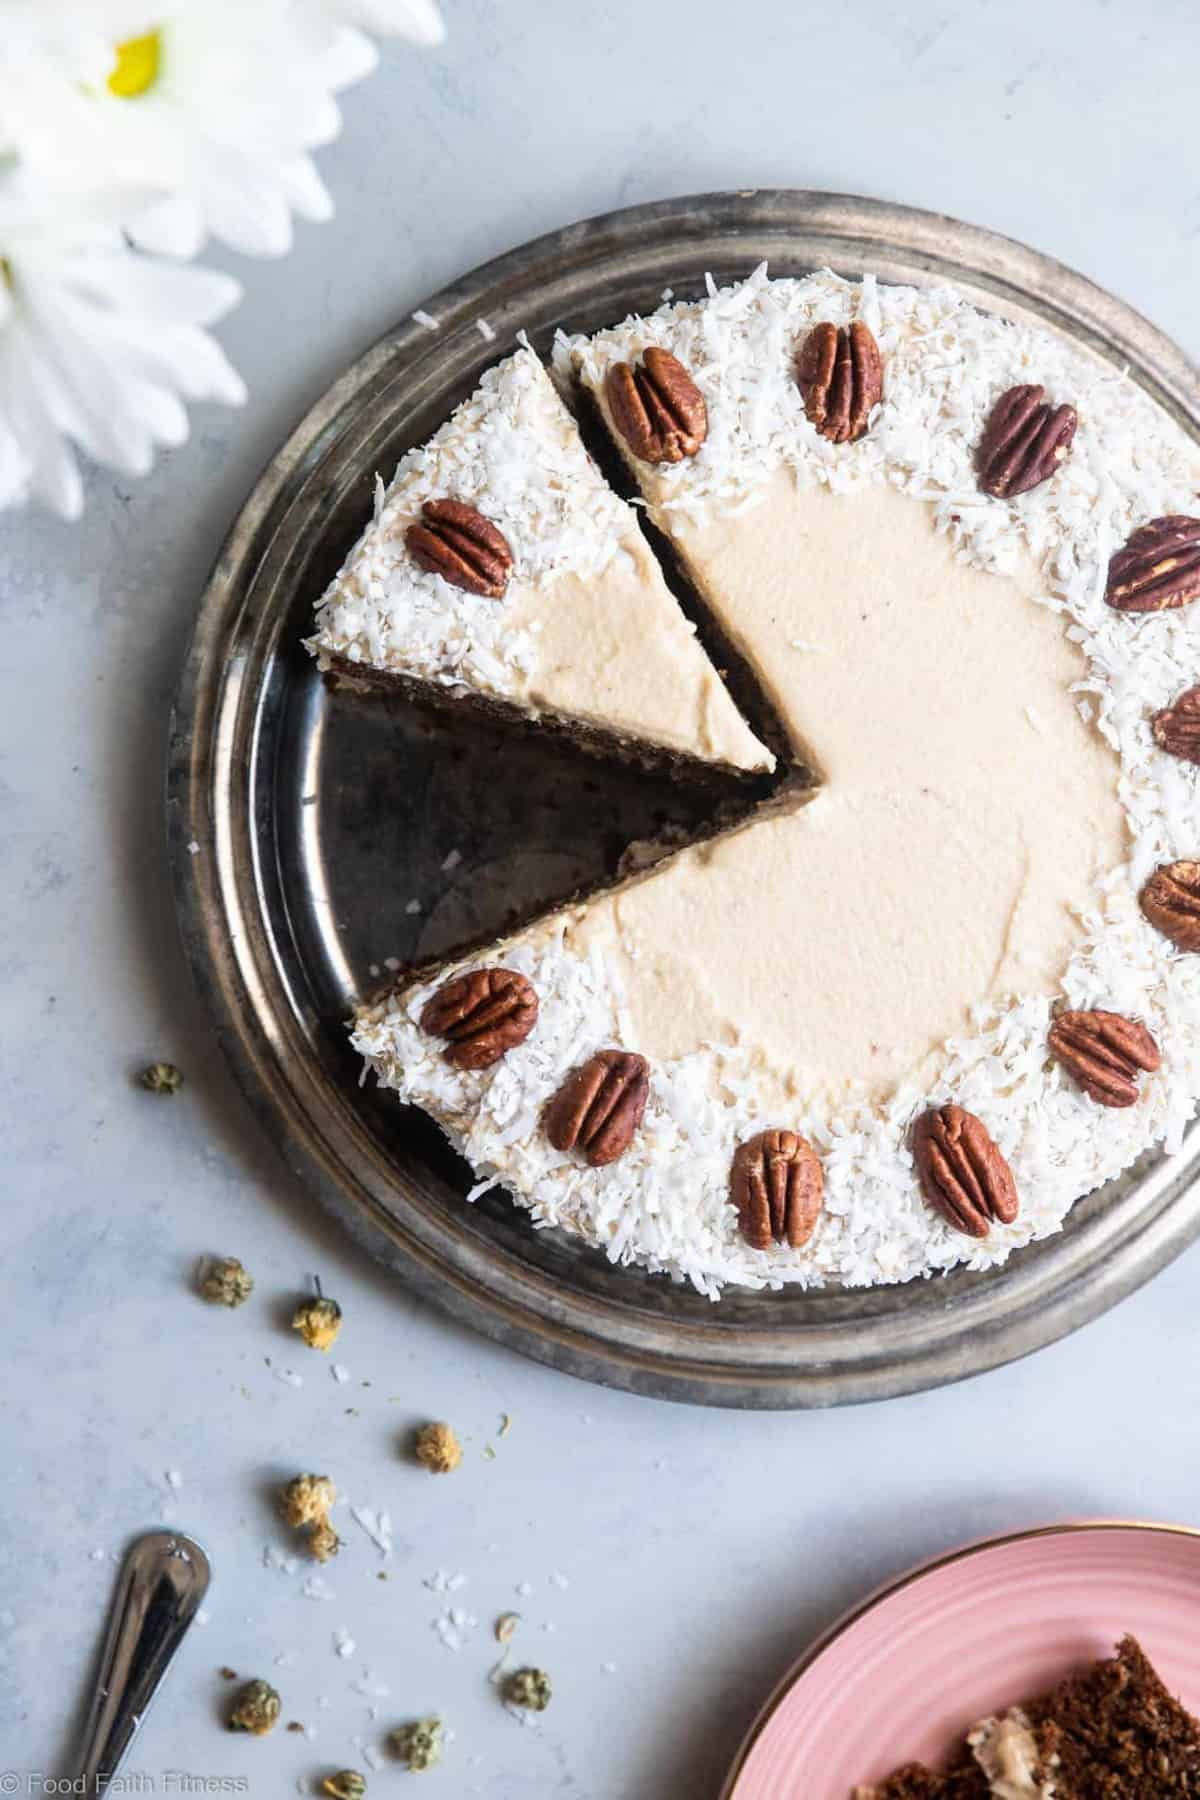 Paleo Carrot Cake - This dairy, grain and gluten free, Paleo Carrot Cake has a luscious cashew